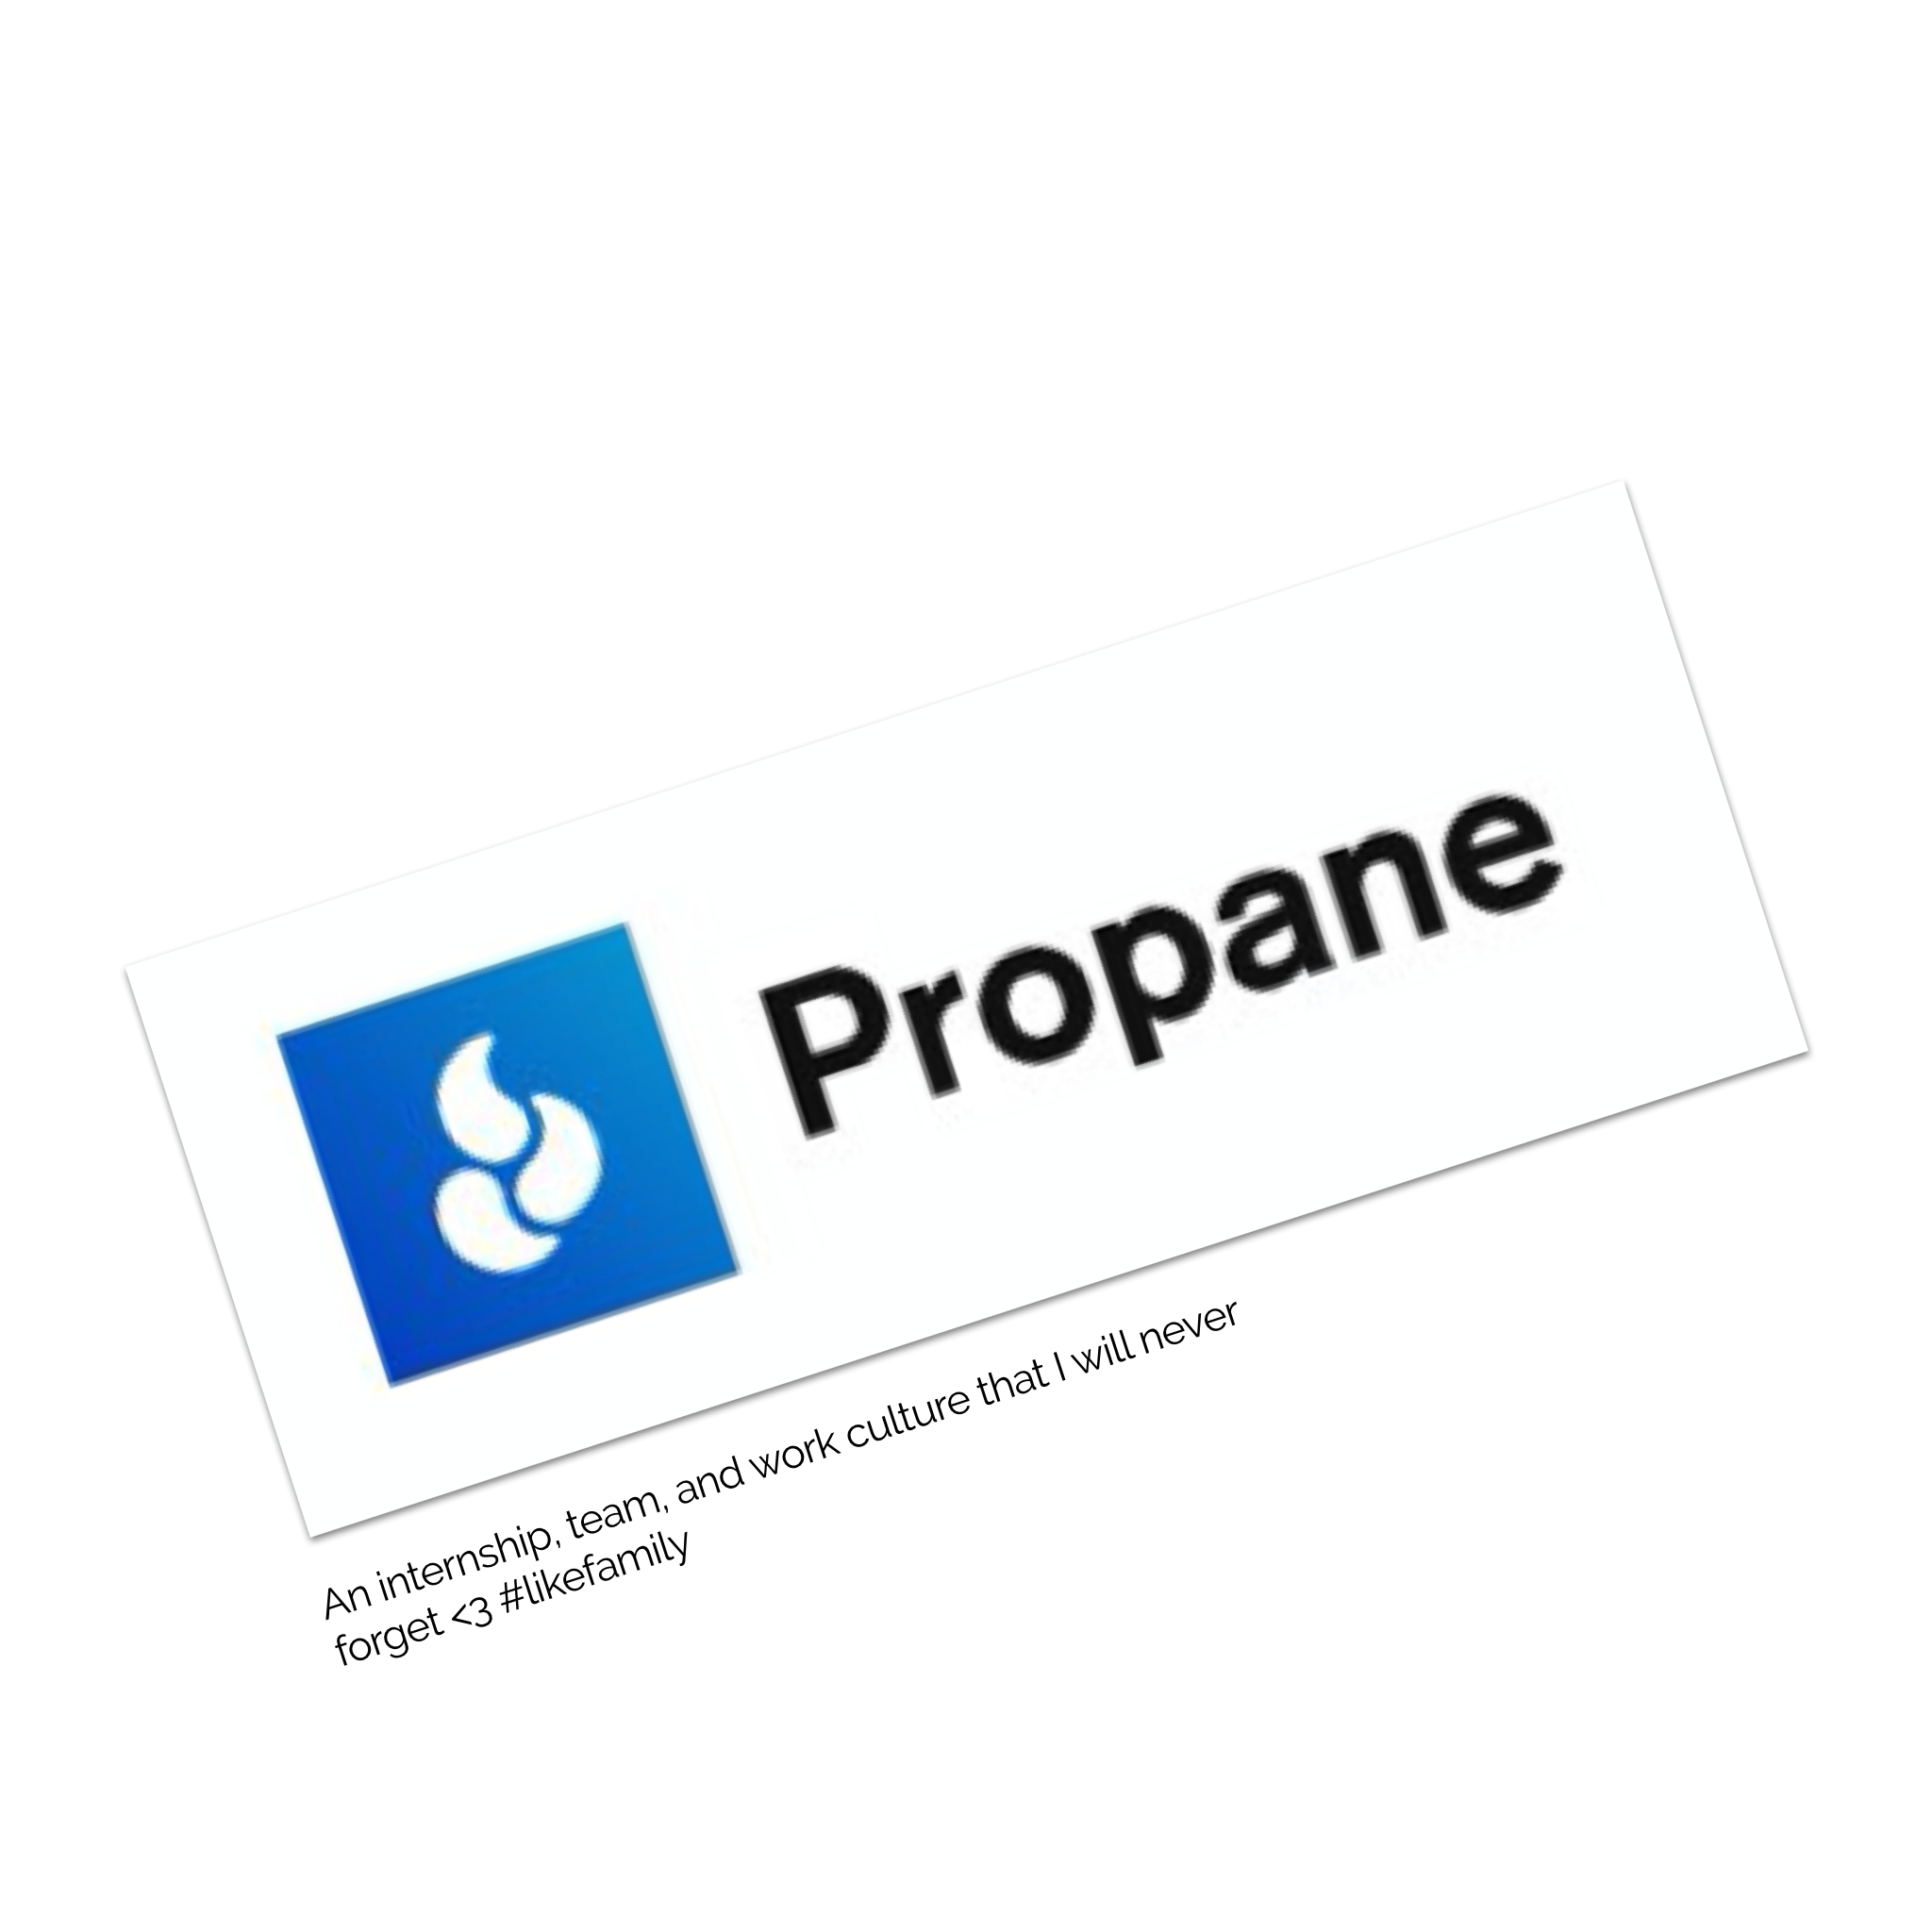 Propane logo image